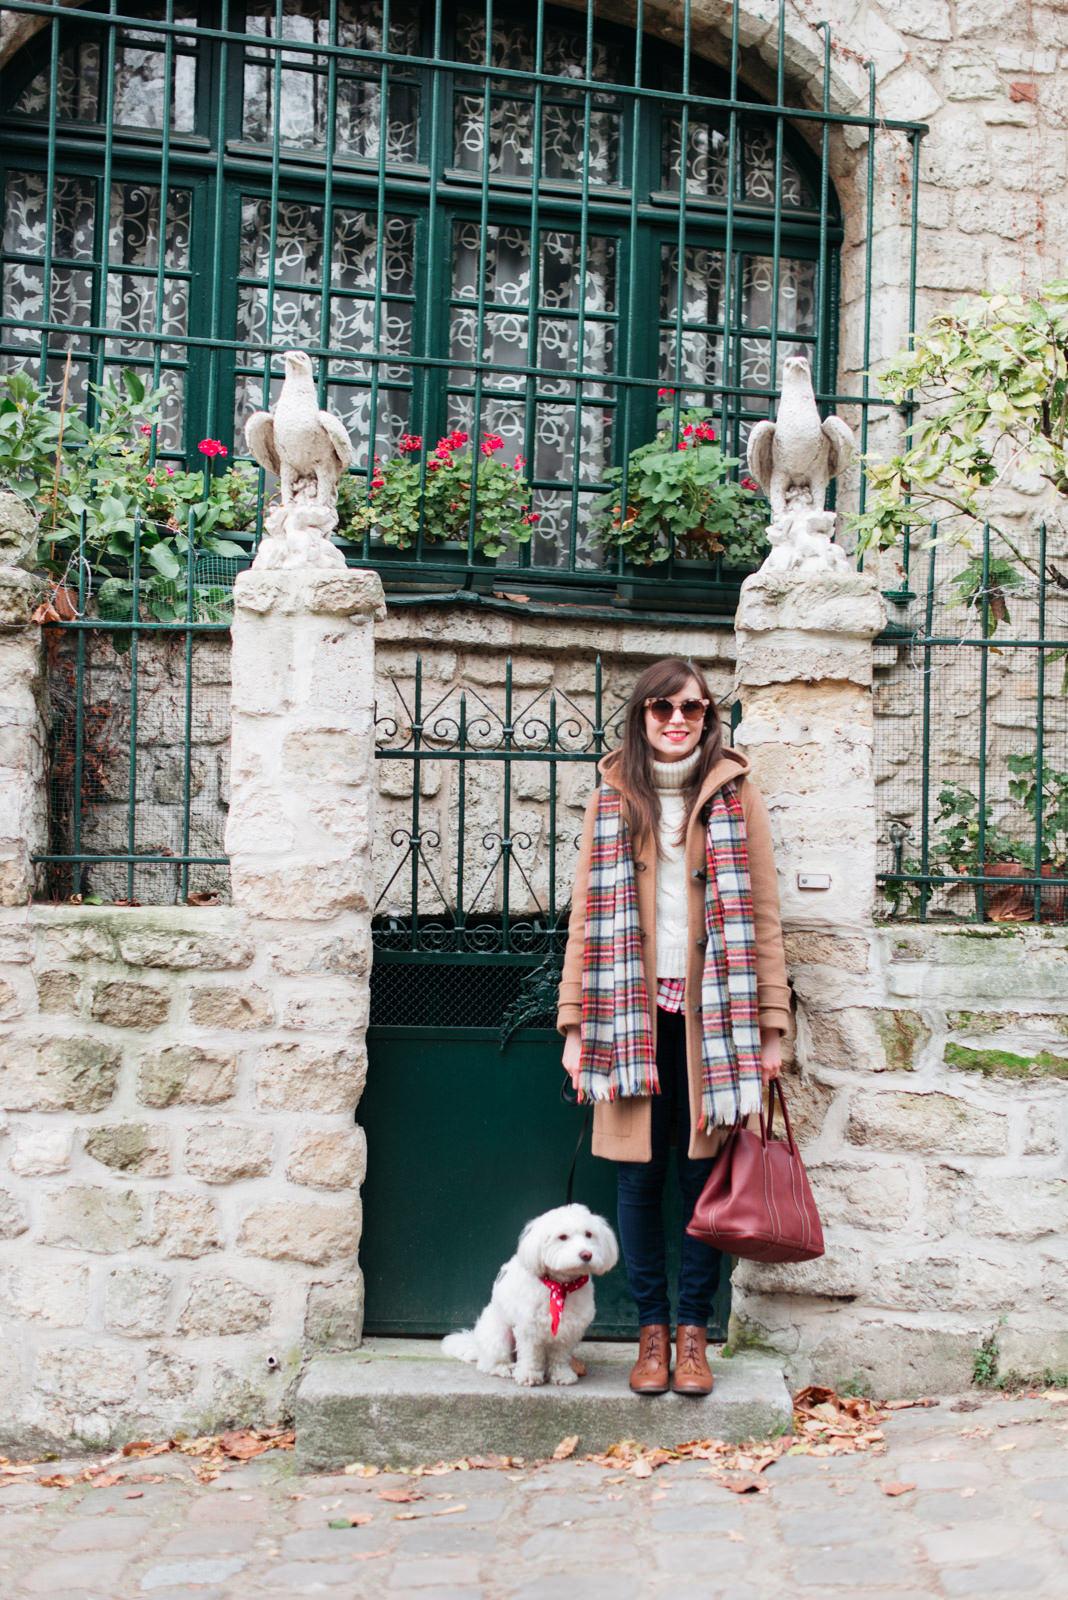 Blog-Mode-And-The-City-Looks-La-Maison-Rose